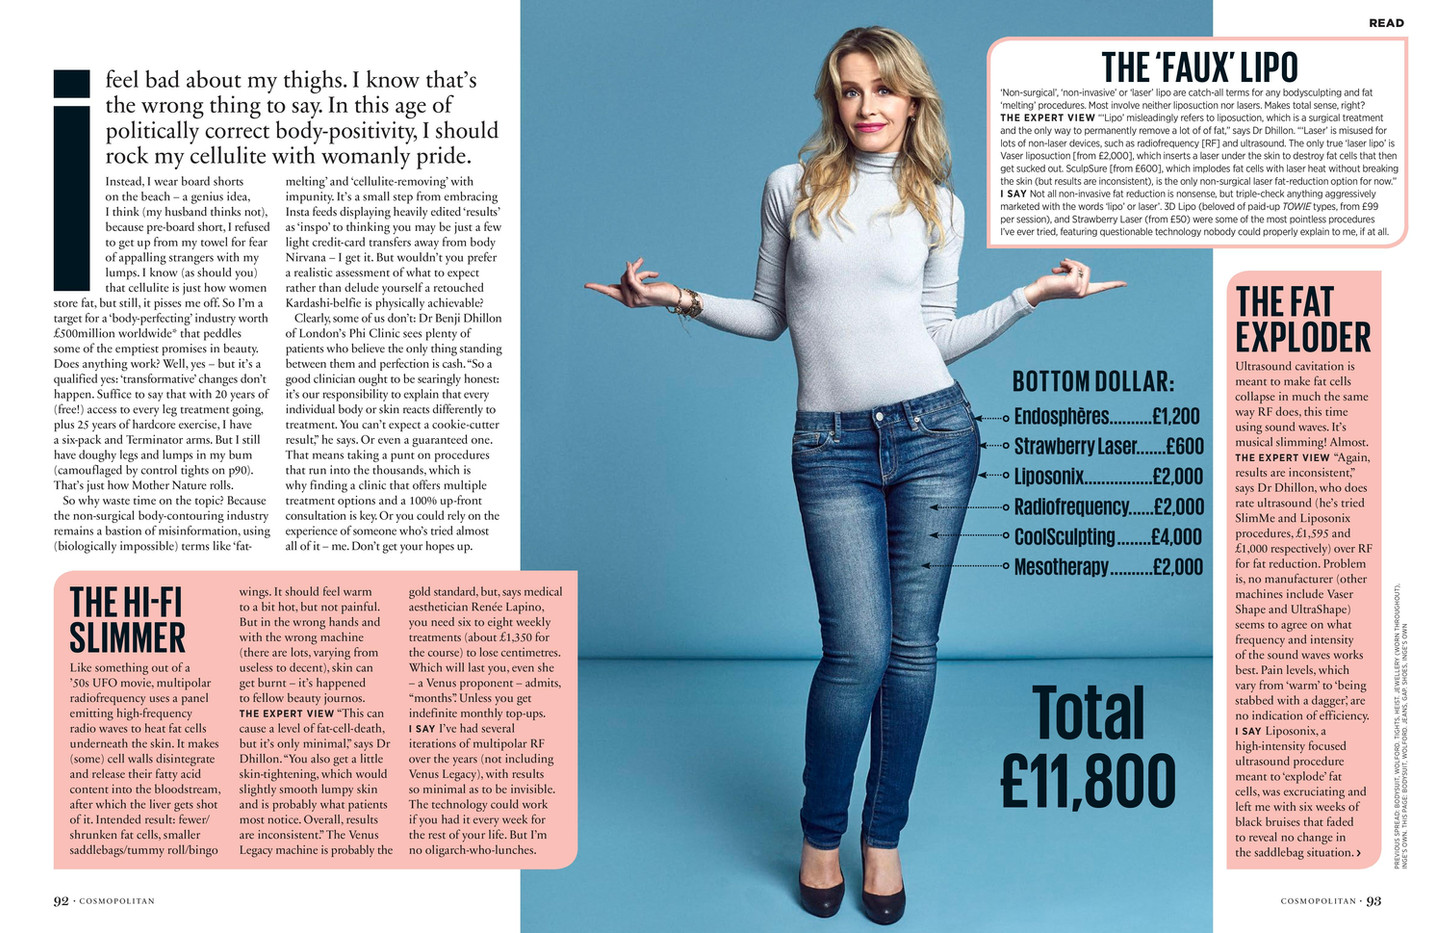 This bottom cost £12,000 – Cosmopolitan